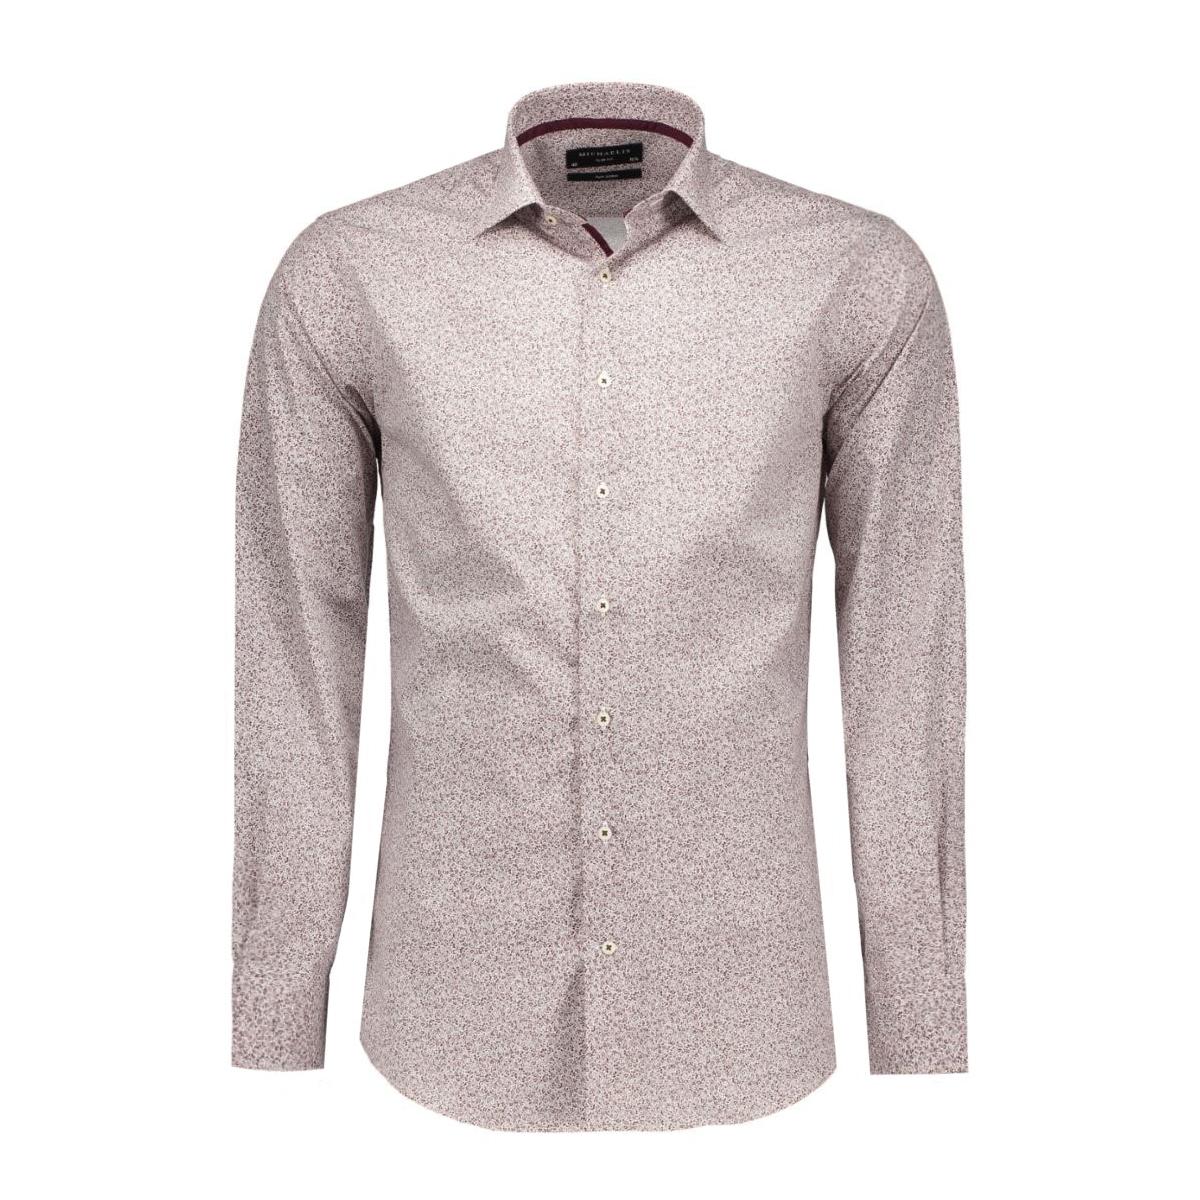 pmnh300001 michaelis overhemd bordeaux